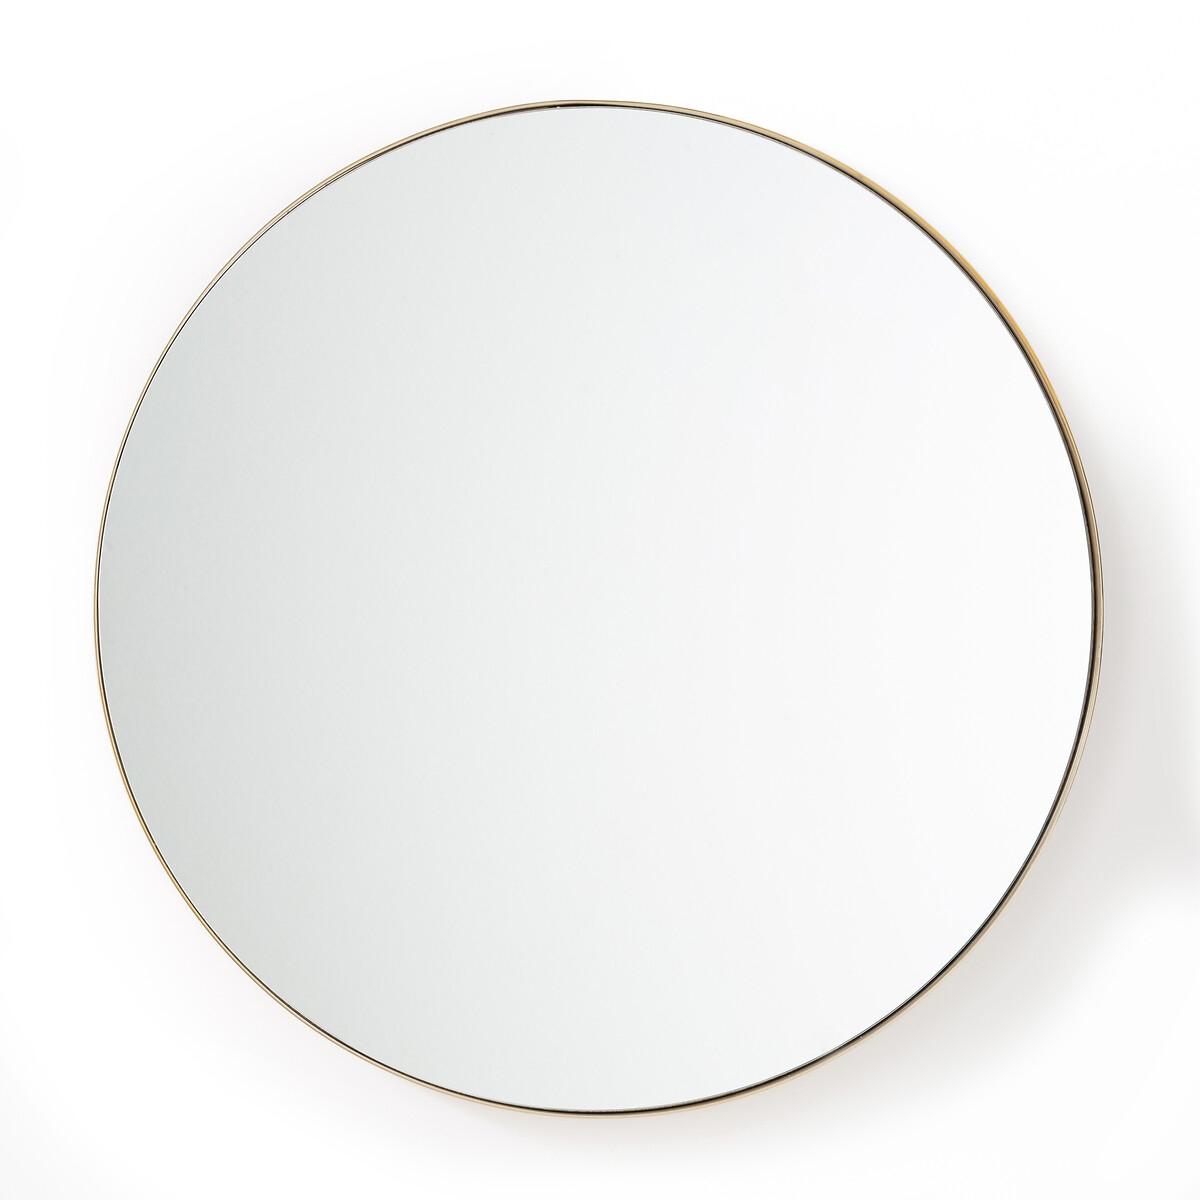 зеркало в форме облака из латуни д45 x в26 см zicowi Зеркало La Redoute Круглое из латуни см Iodus единый размер желтый